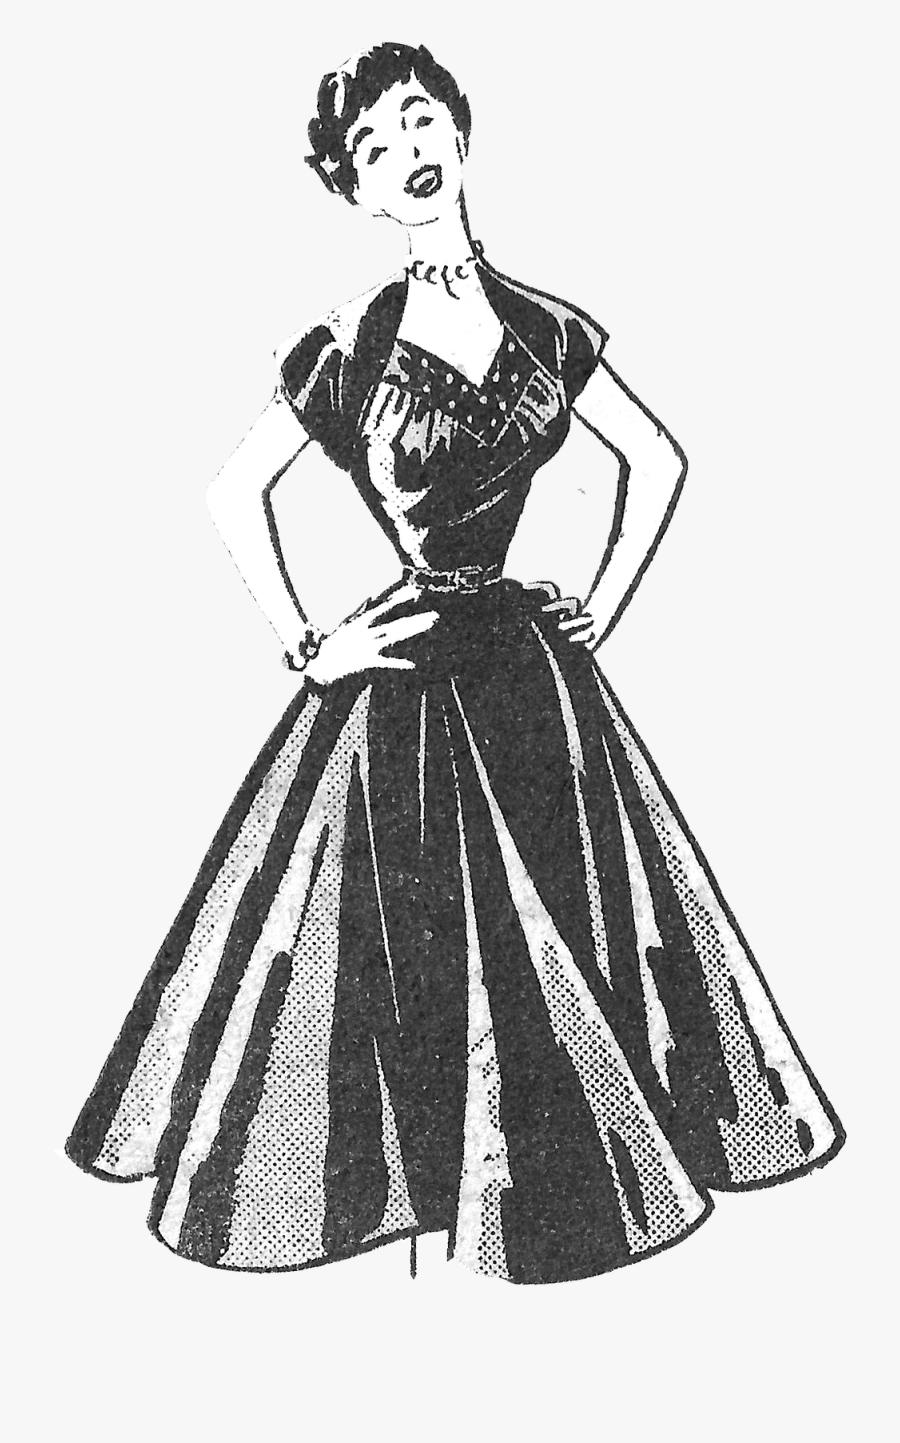 Turkey Bathing Suit Clipart - Printable Vintage Inspired Dresses, Transparent Clipart